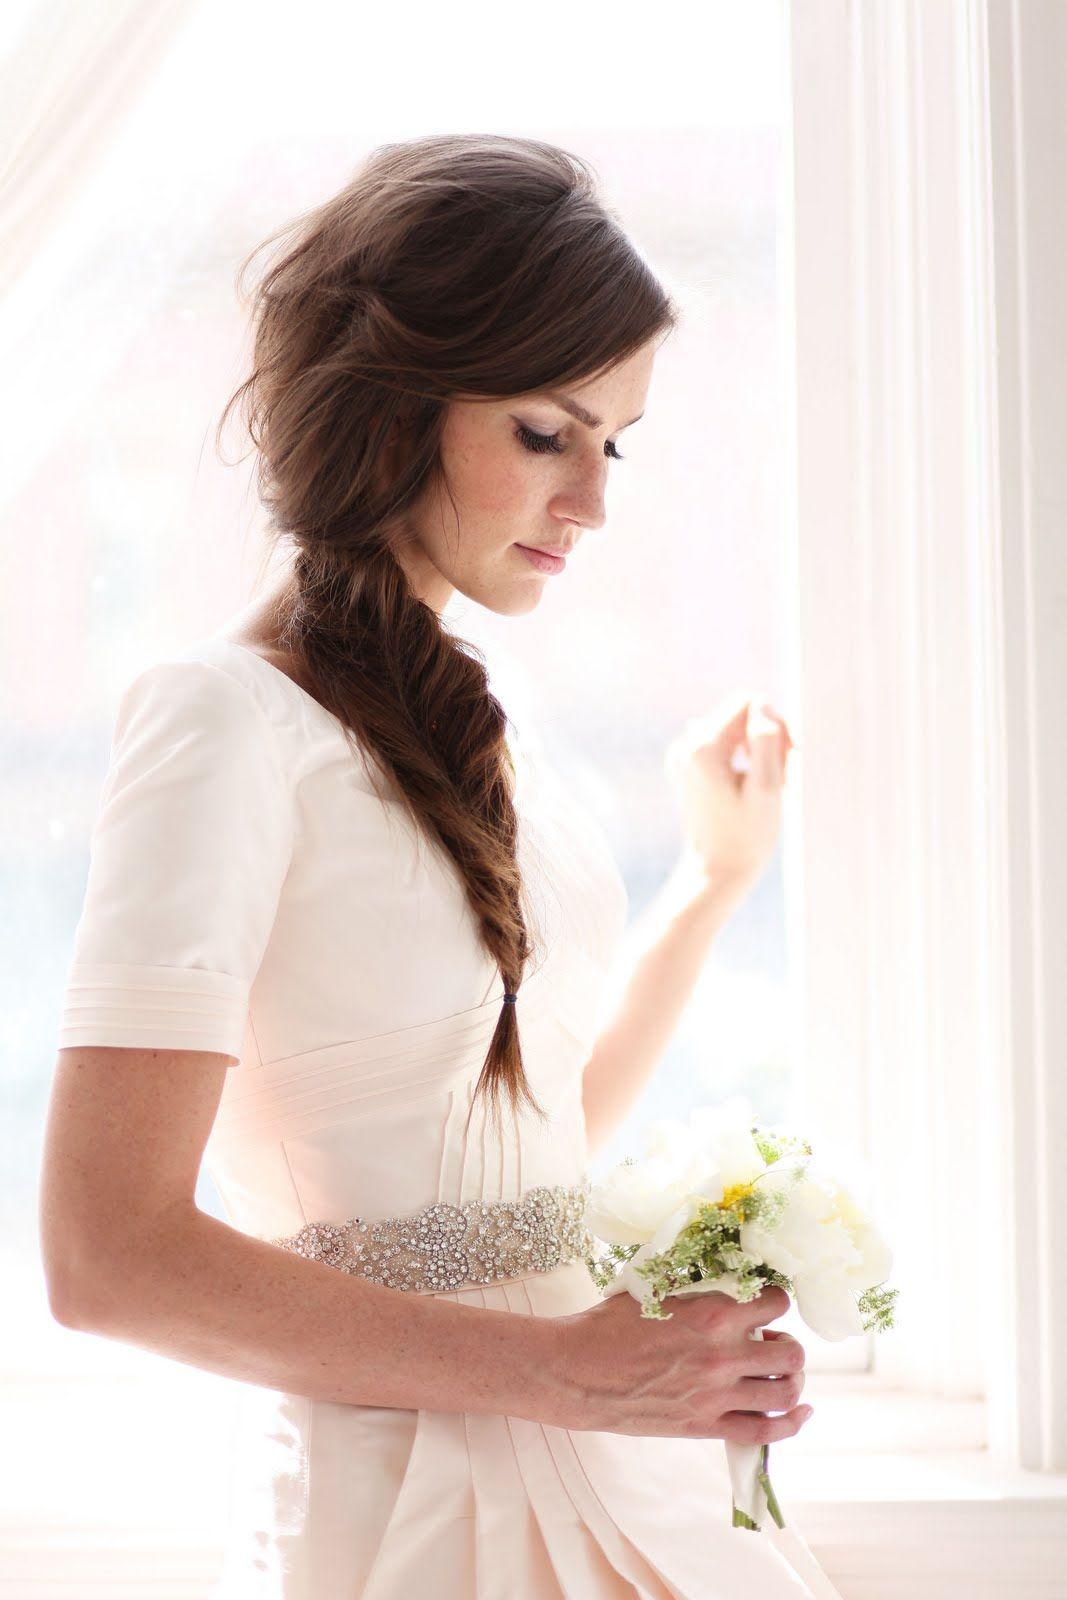 Pin by Charmaine Lye on Wedding hairstyles   Pinterest   Weddings ...